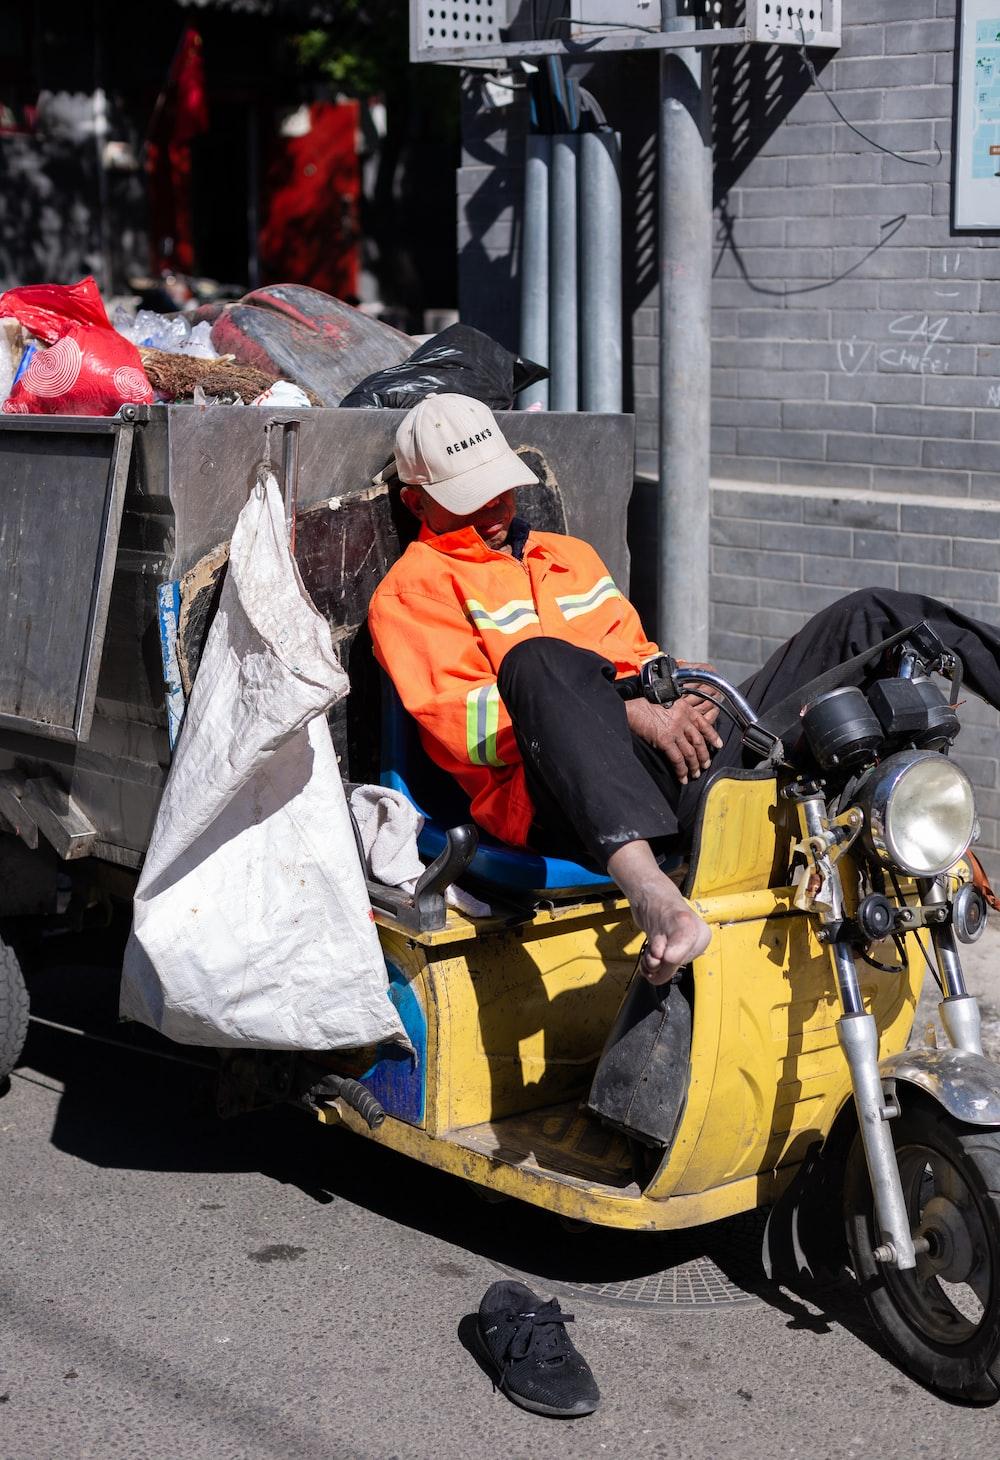 man in orange and white jacket sitting on yellow motorcycle during daytime